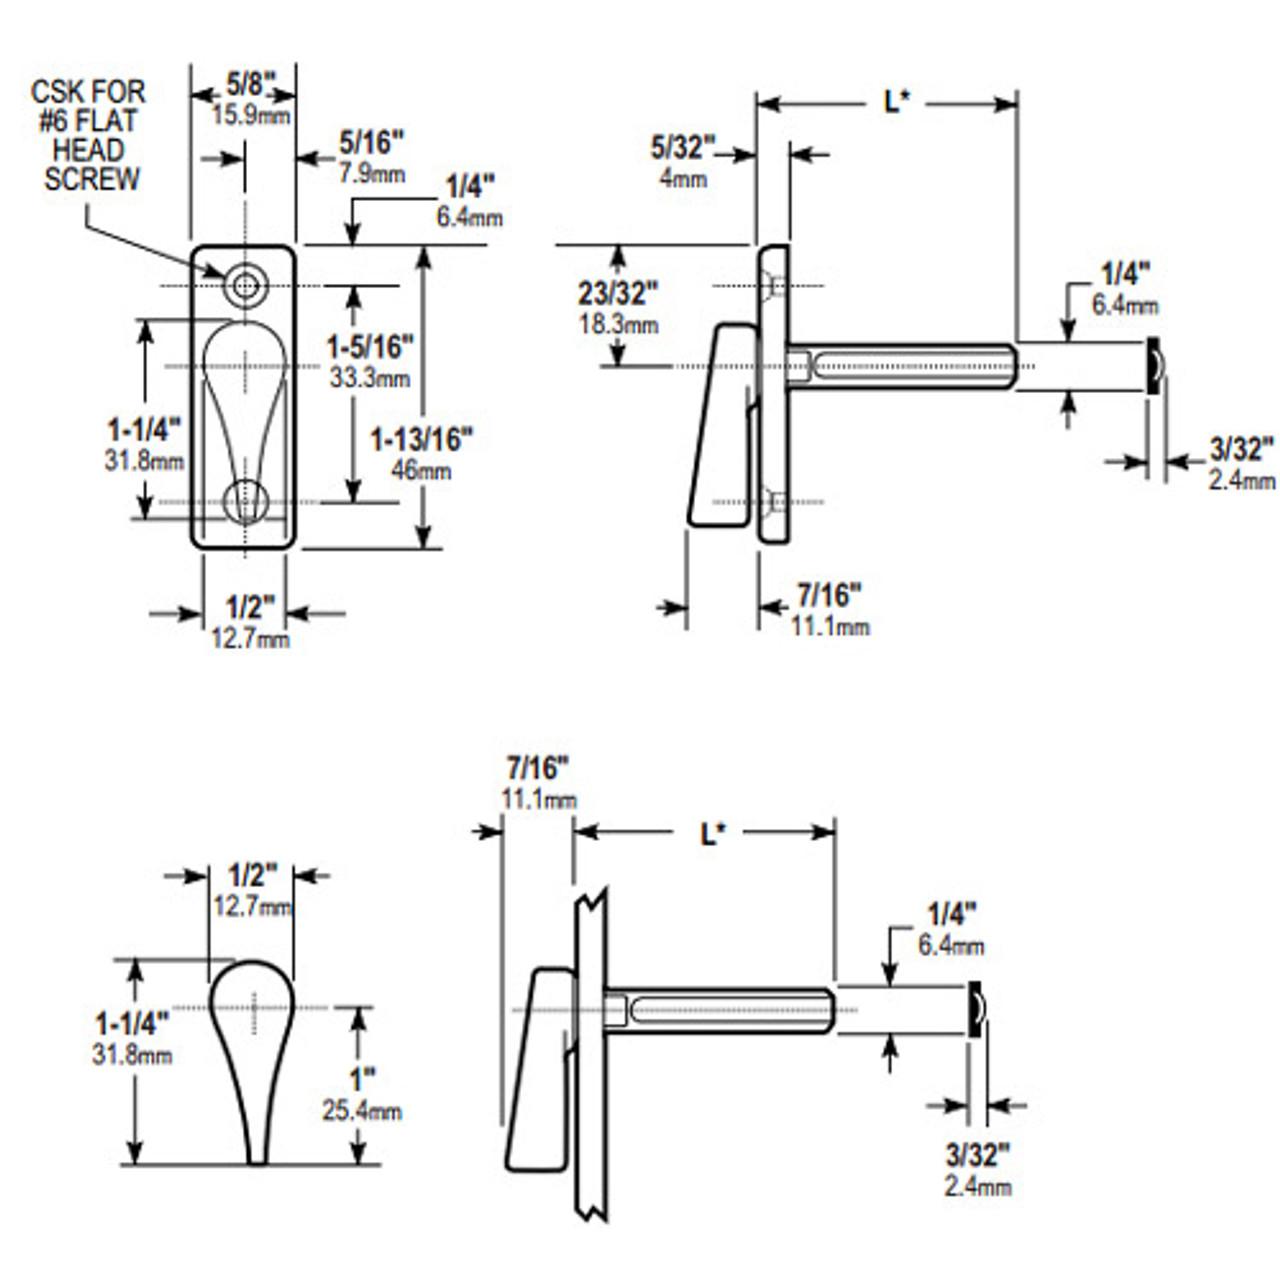 1000-02-32-119 Adams Rite 1000 Series Turns Dimensional View